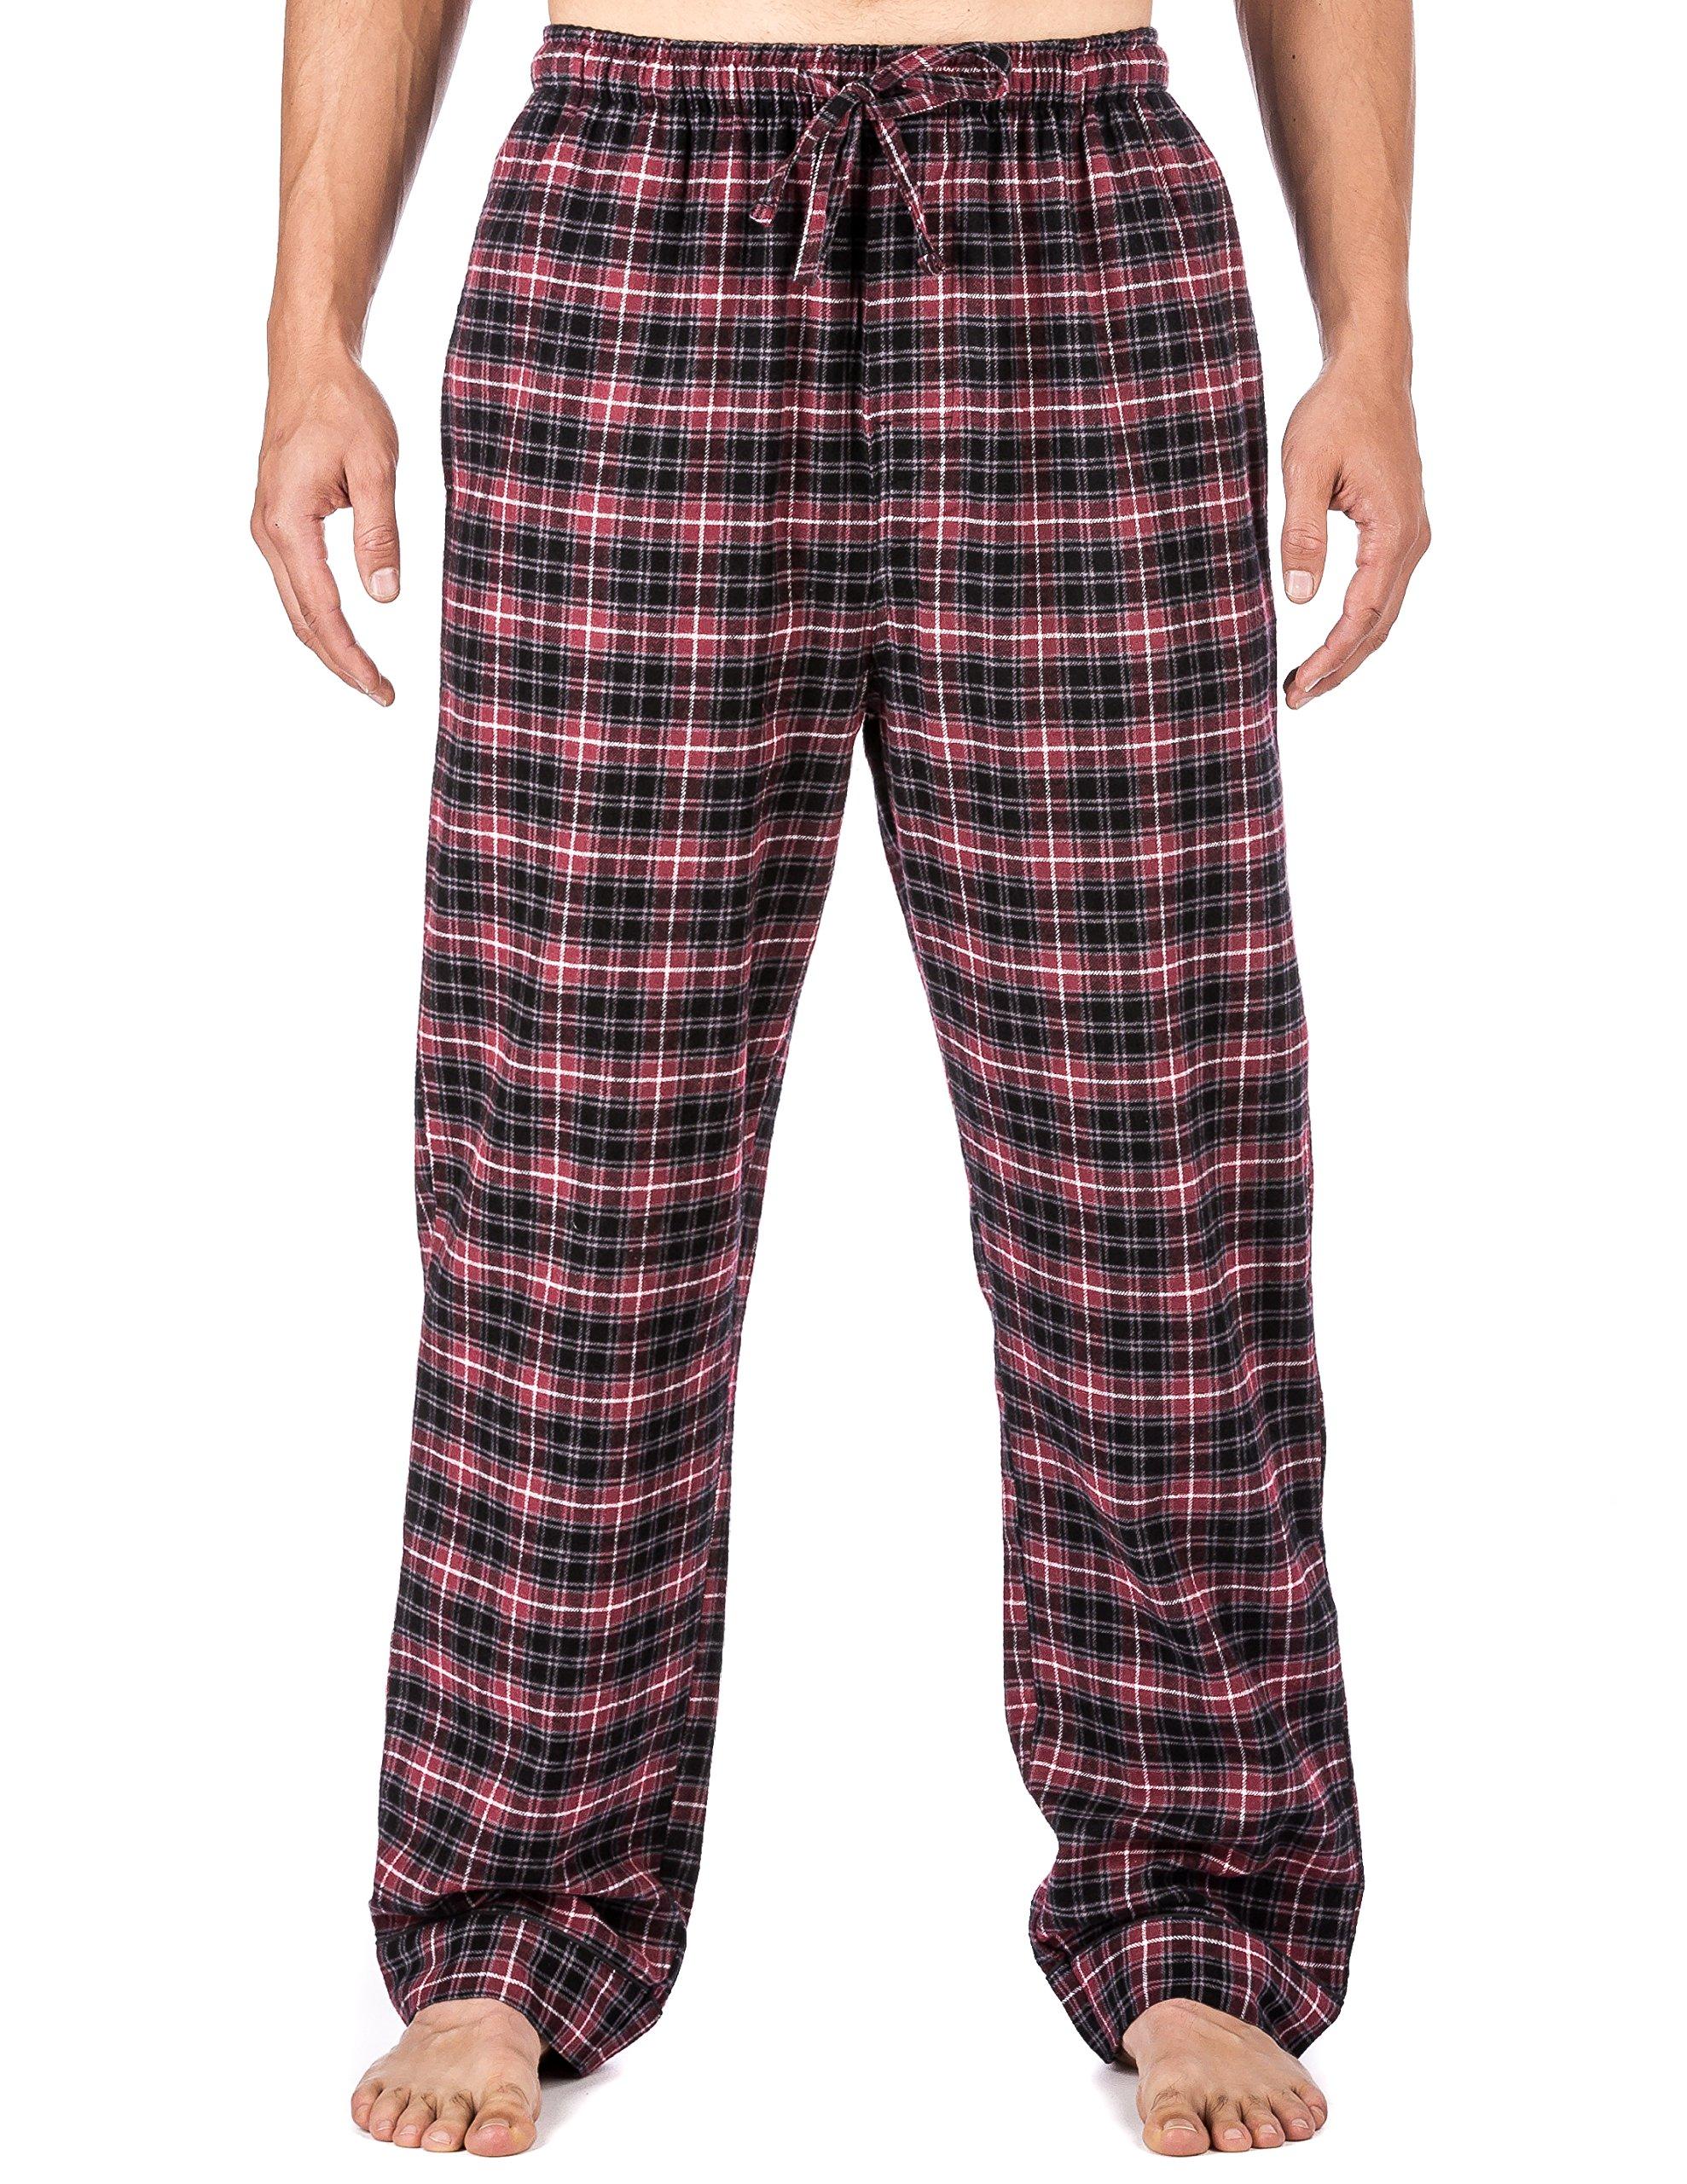 Noble Mount Mens Premium Flannel Lounge Pants - Plaid Burgundy/Grey - Medium